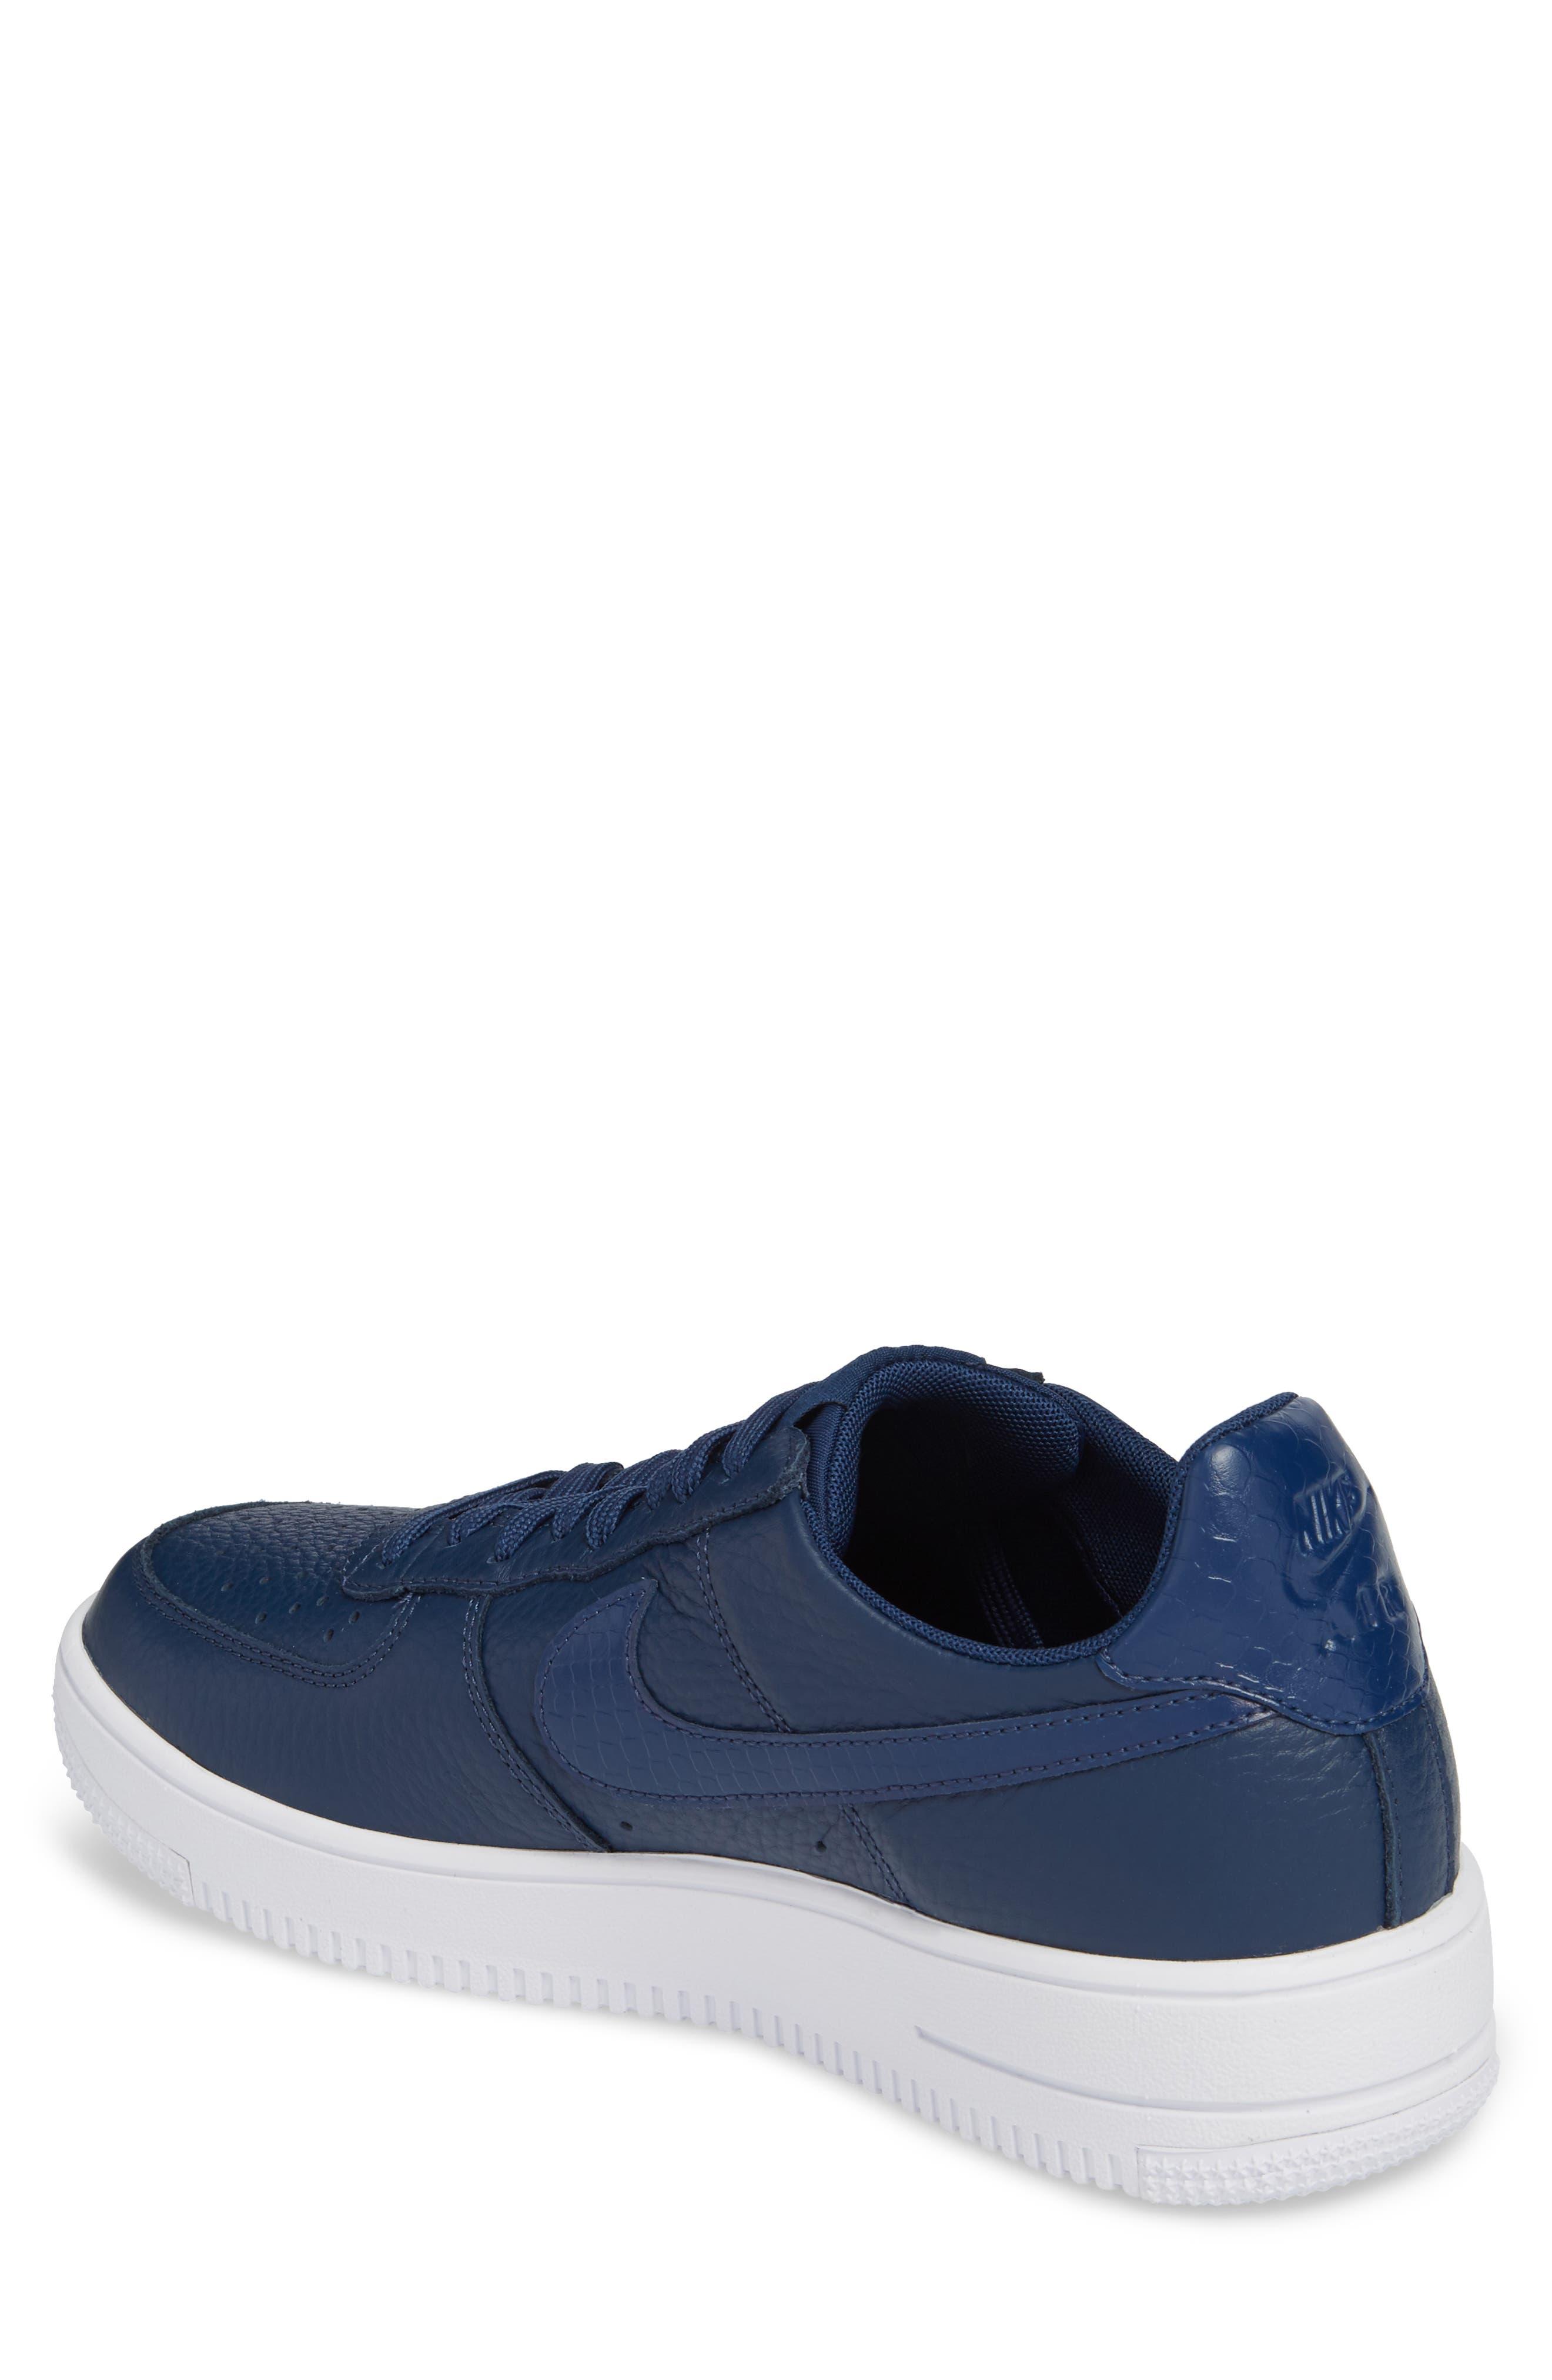 Air Force 1 Ultraforce Sneaker,                             Alternate thumbnail 2, color,                             Navy/ Navy/ White